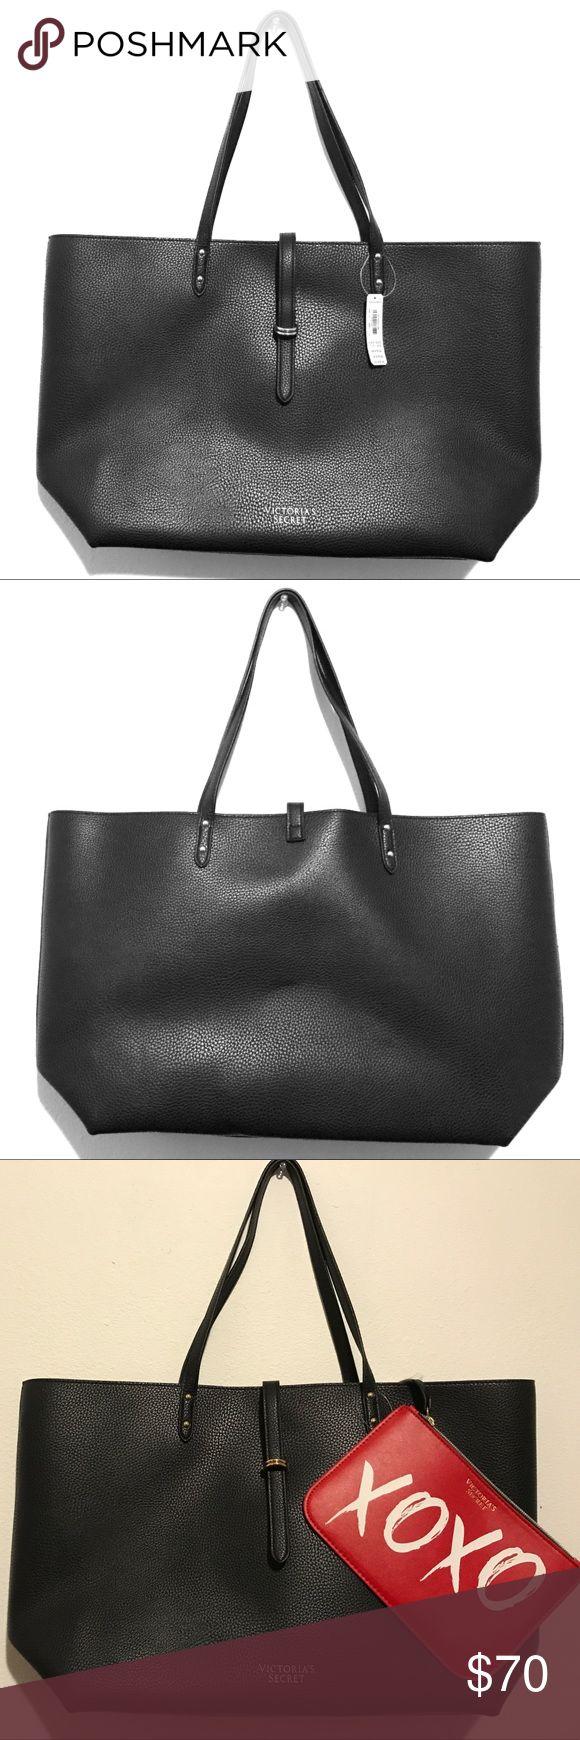 Black Victoria Secret Tote Bag & XOXO Small Bag BRAND NEW! VS Black Tote Bag with gold detailing and red interior. Victoria's Secret Bags Totes